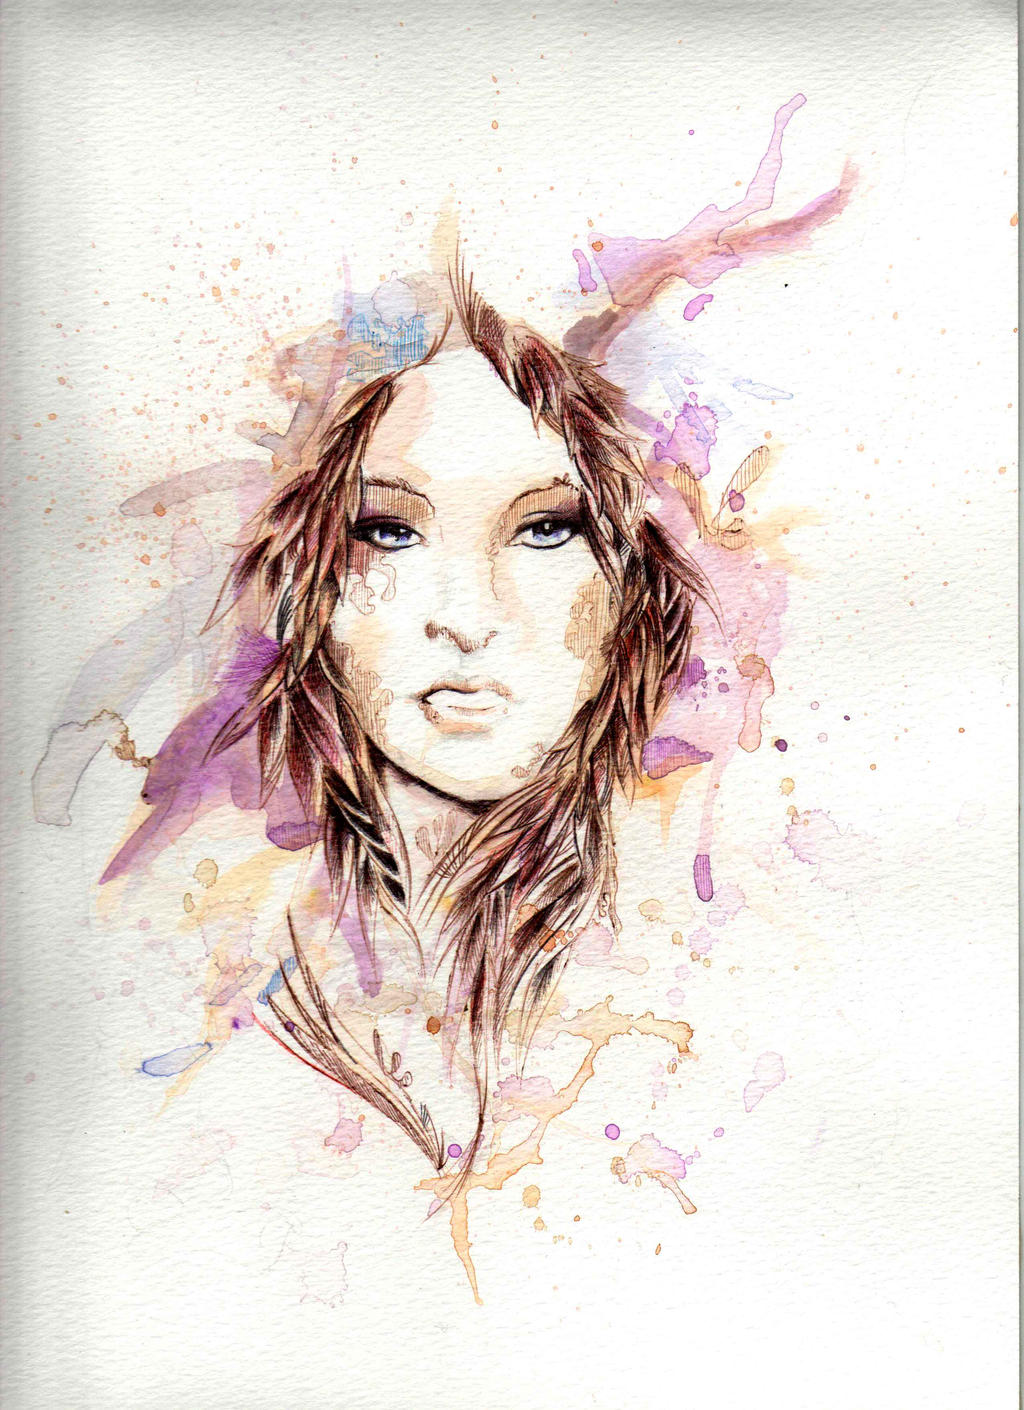 Watercolor + ballpoint ink pen. by Kartesh on DeviantArt